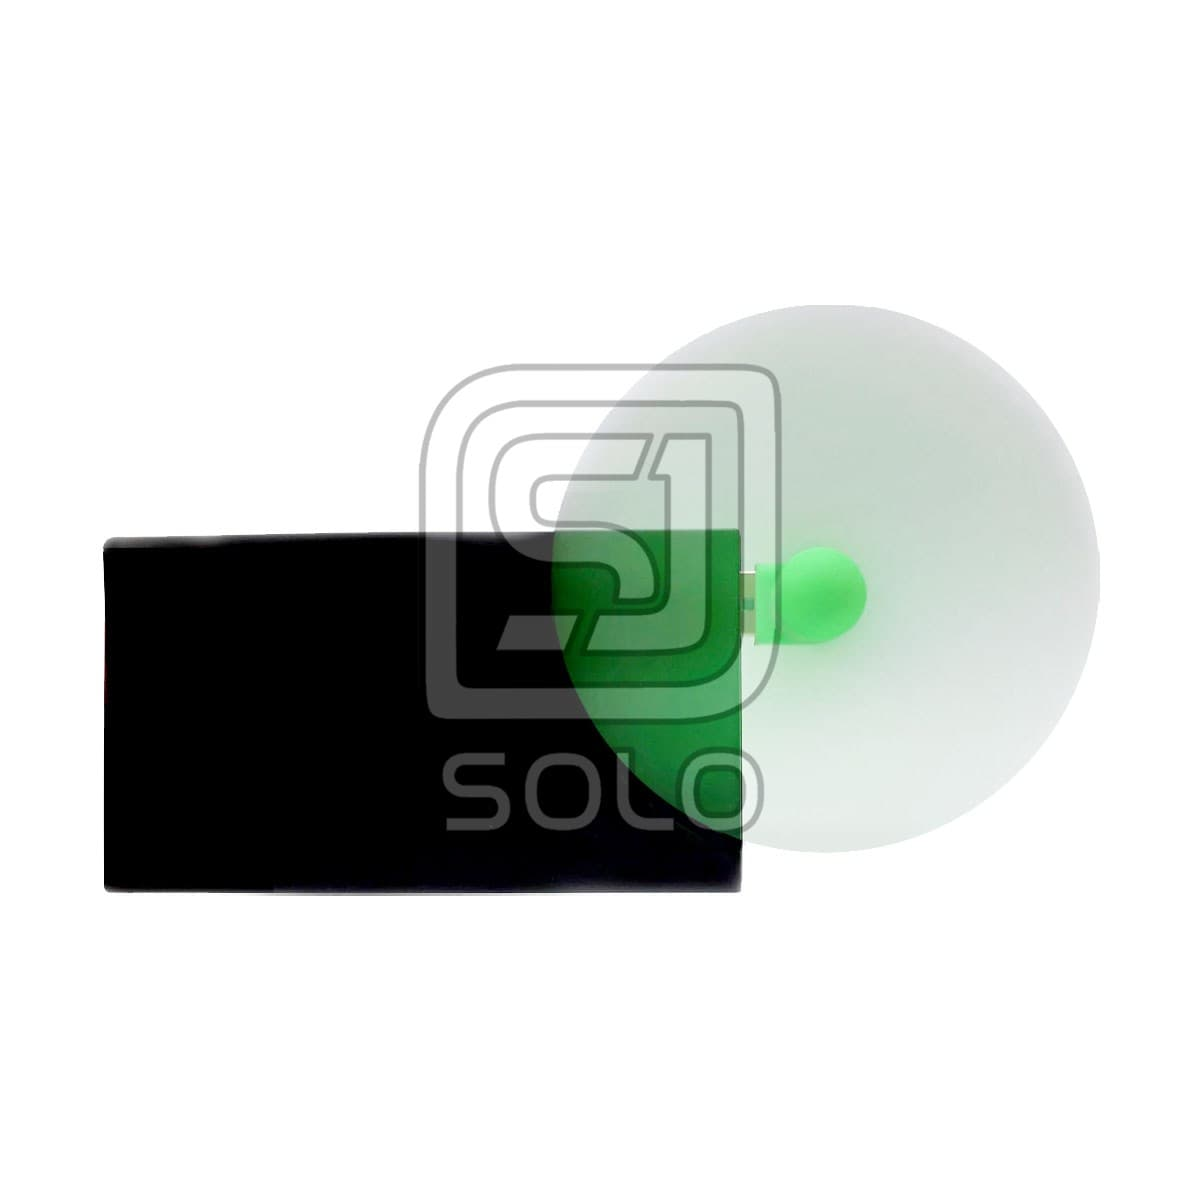 Jual Kipas Otg Hp Angin Mini Usb Micro 2in1 Fan Android Blanja